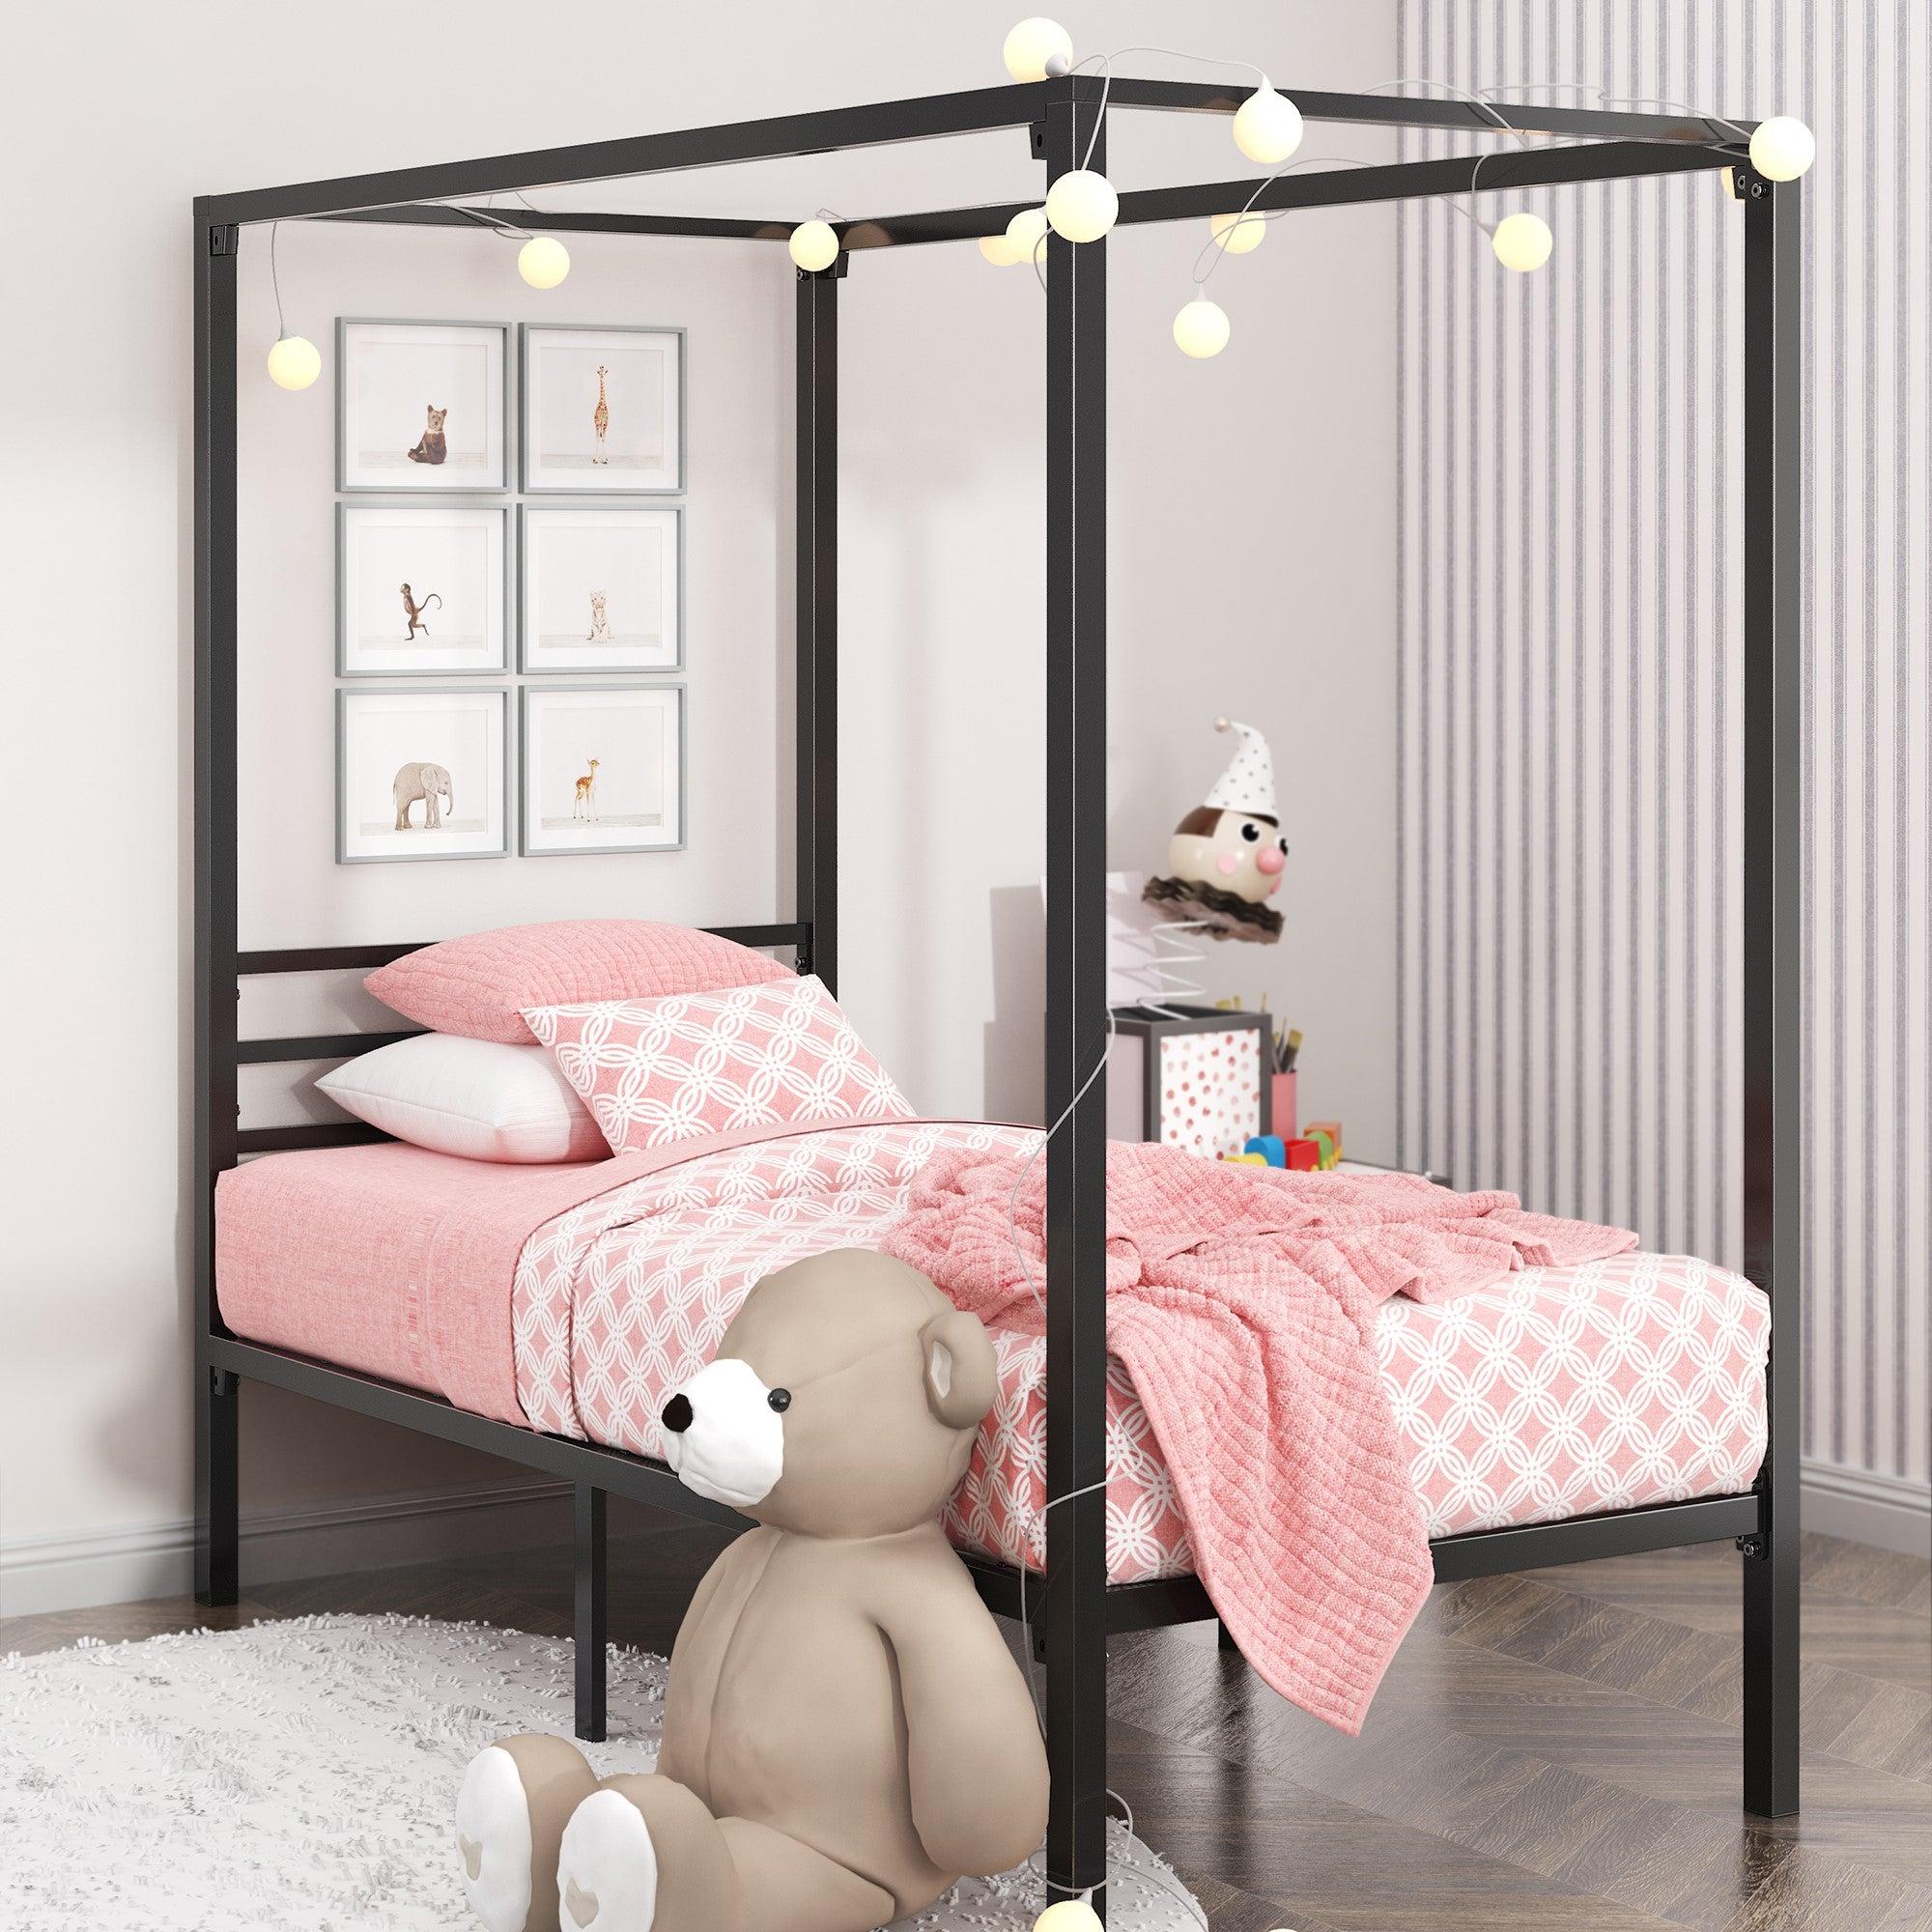 Zinus Kids Patricia Single Size Bed Frame Toddler Canopy - Black Metal